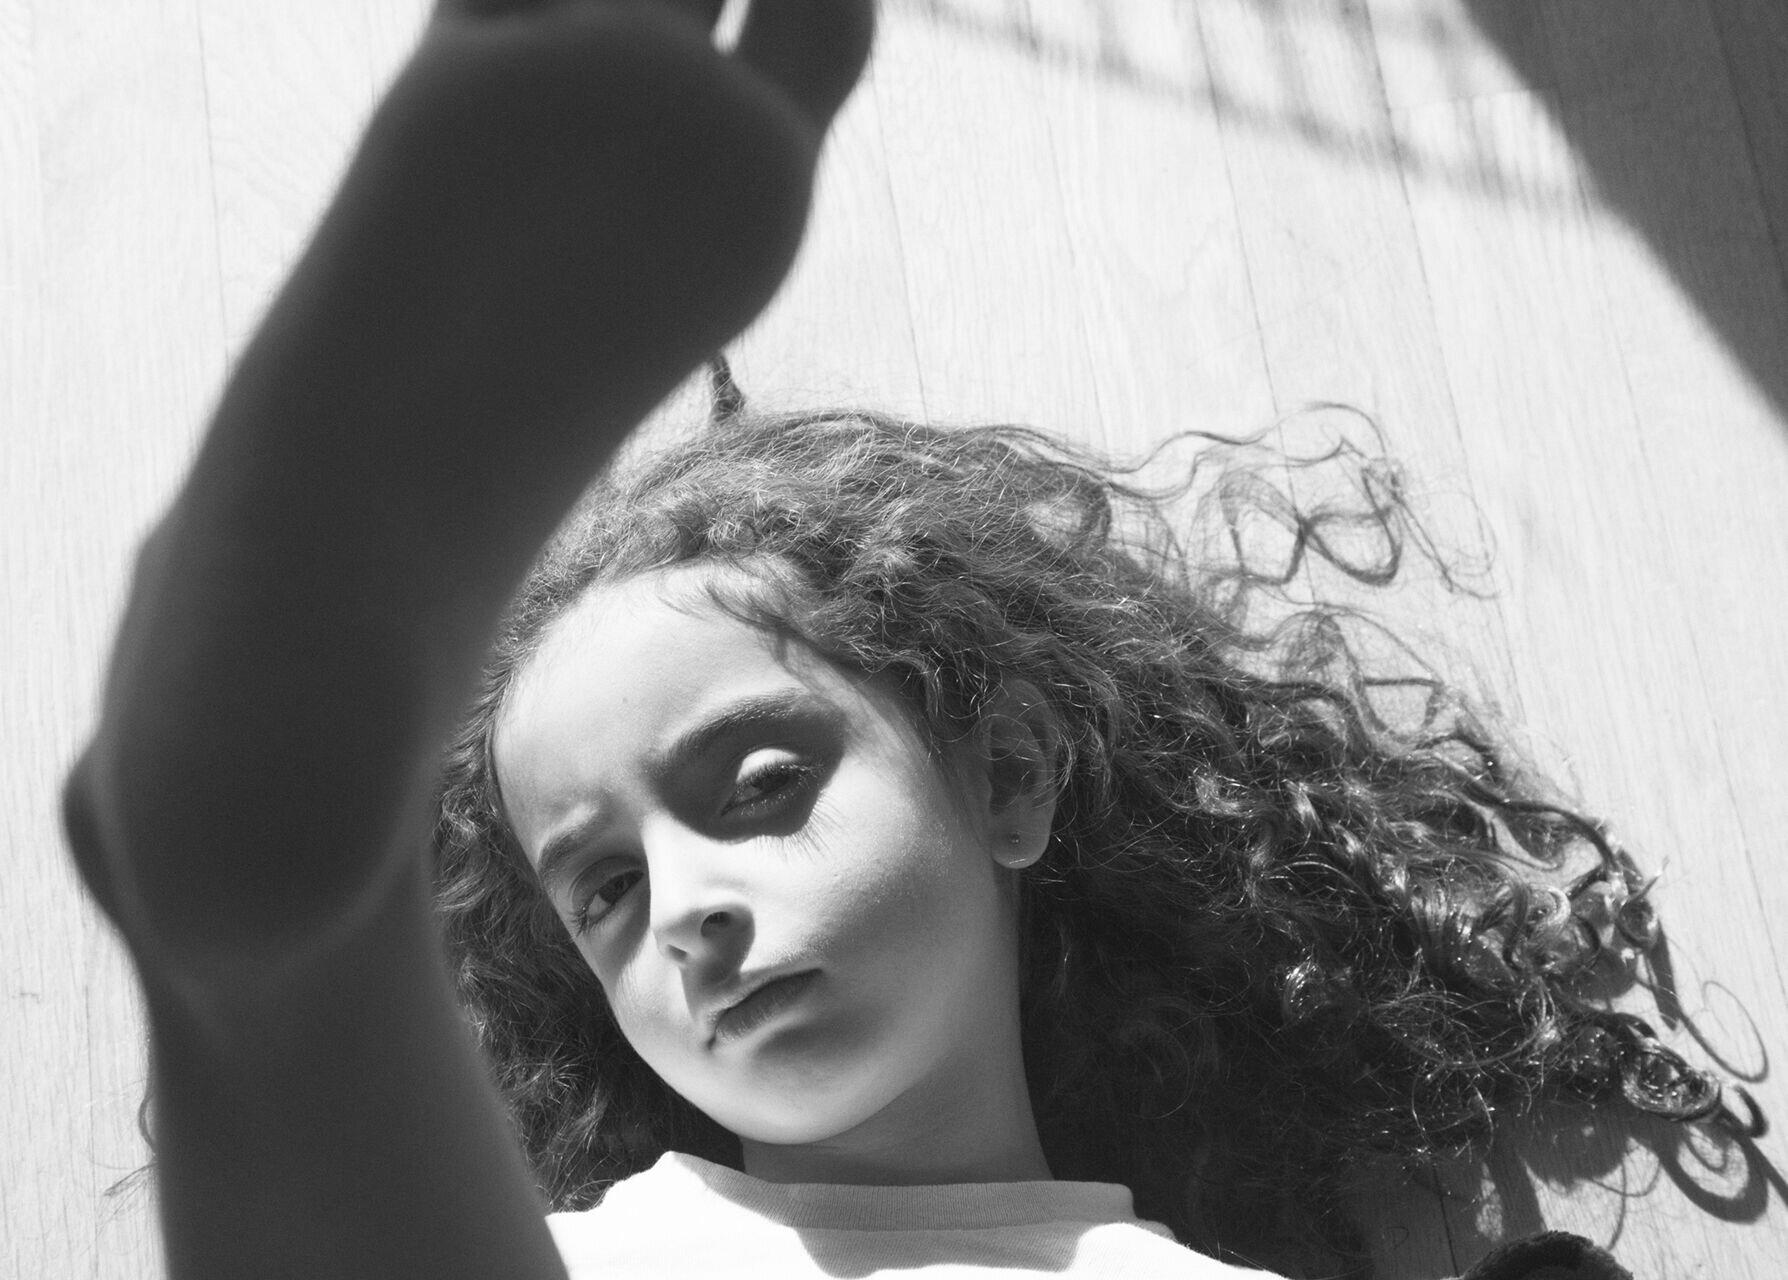 Daphne (Foot) ©Talia Chetrit, 'Showcaller' published by  MACK